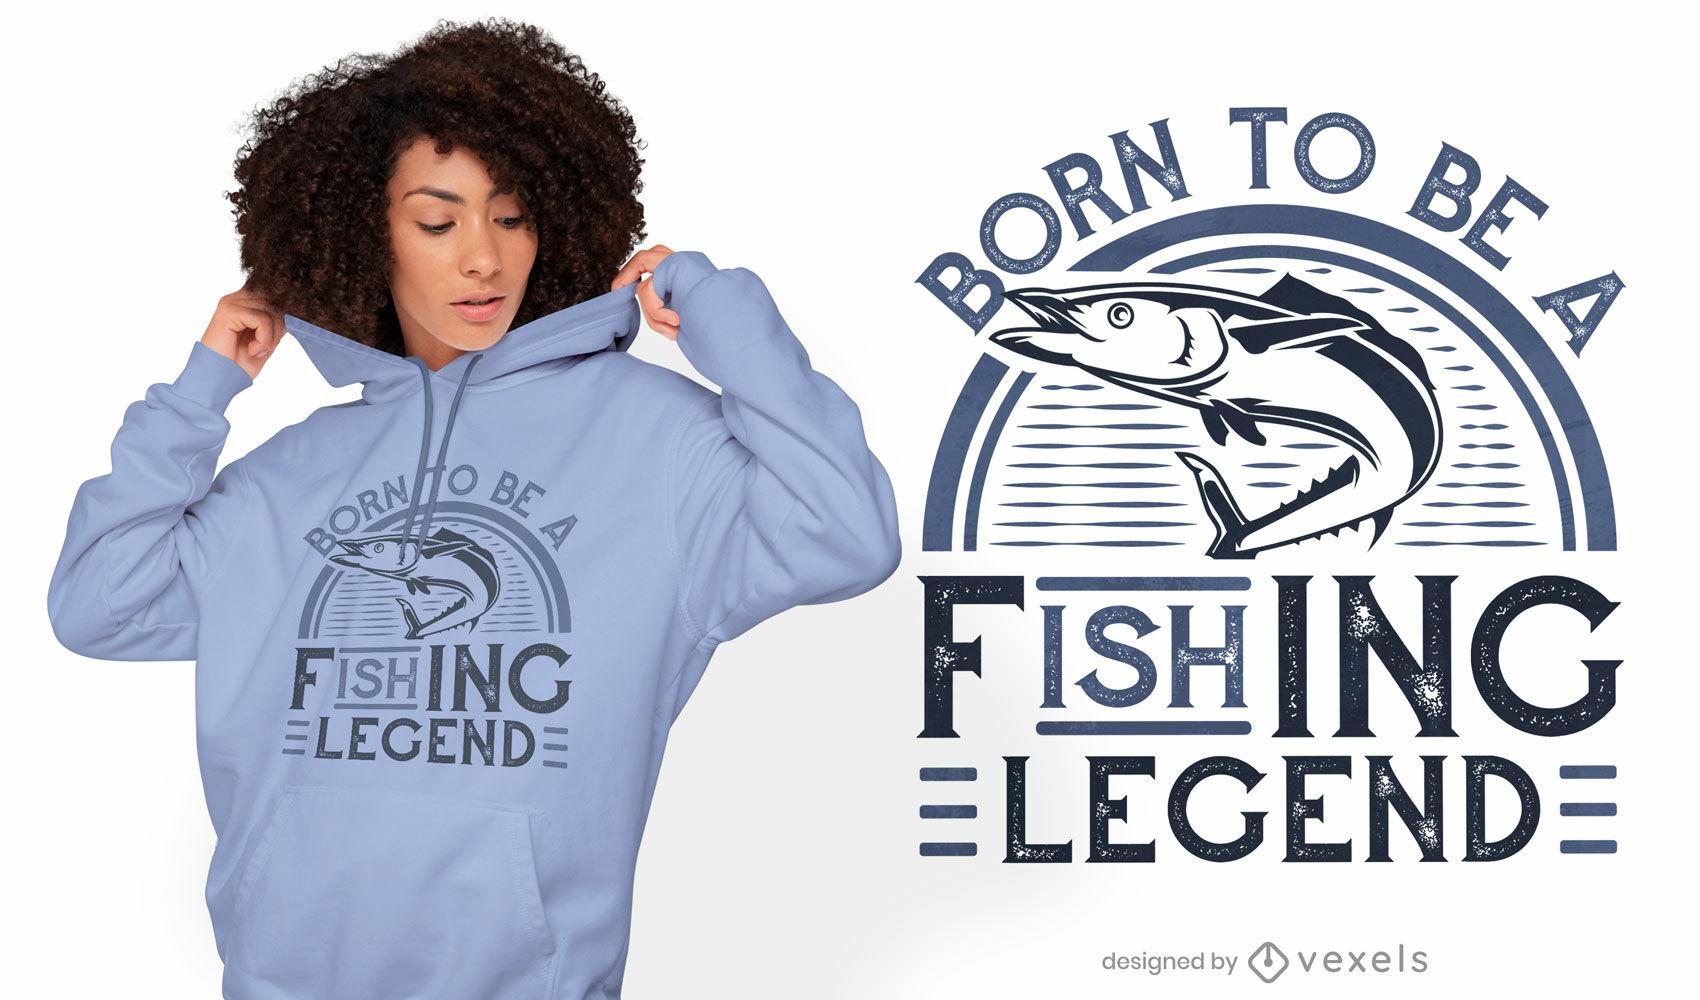 Fishing legend t-shirt design